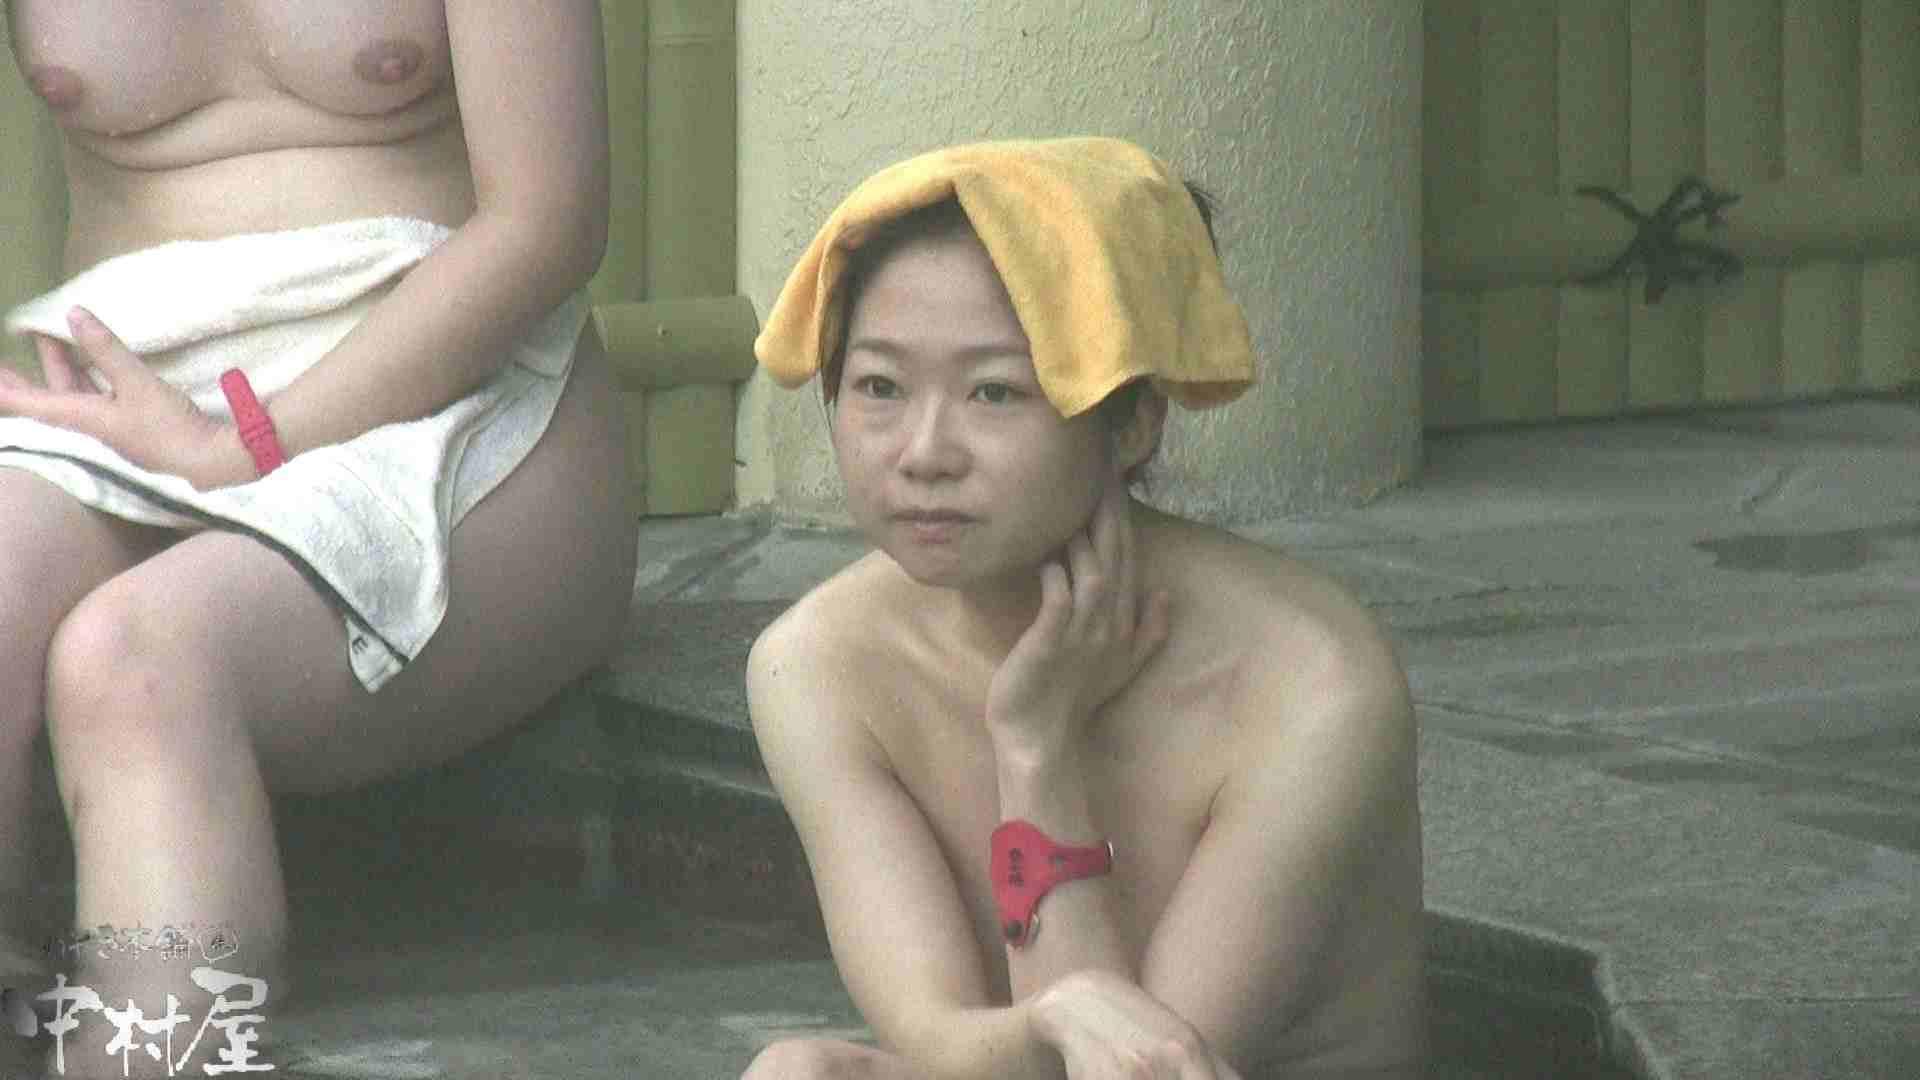 Aquaな露天風呂Vol.912 OLセックス   盗撮  62画像 22